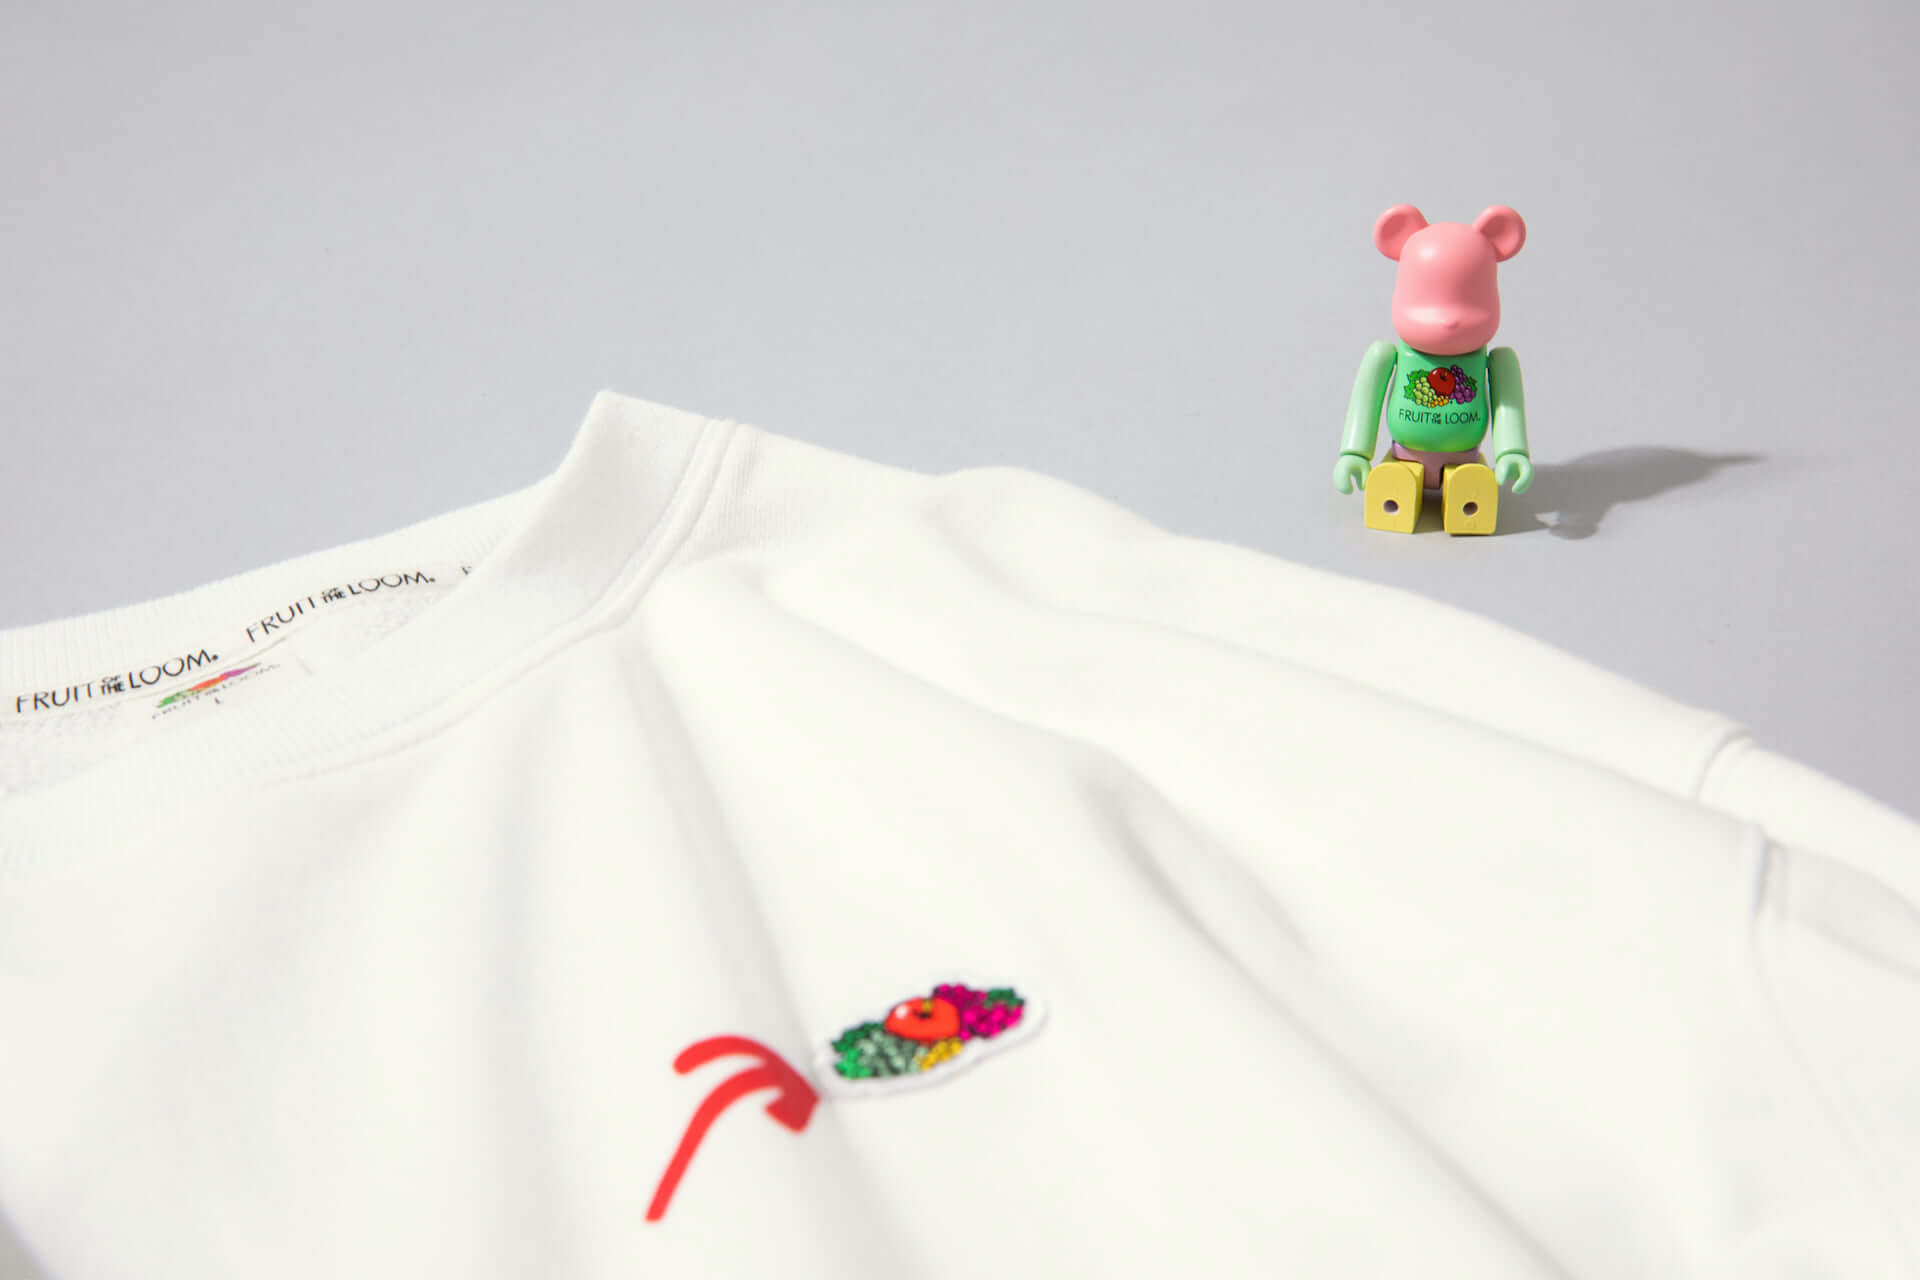 FRUIT OF THE LOOMから限定スウェットシャツが販売決定!フルーツカラーの『BE@RBRICK』も付属 lf200907_fruitoftheloom_4-1920x1280